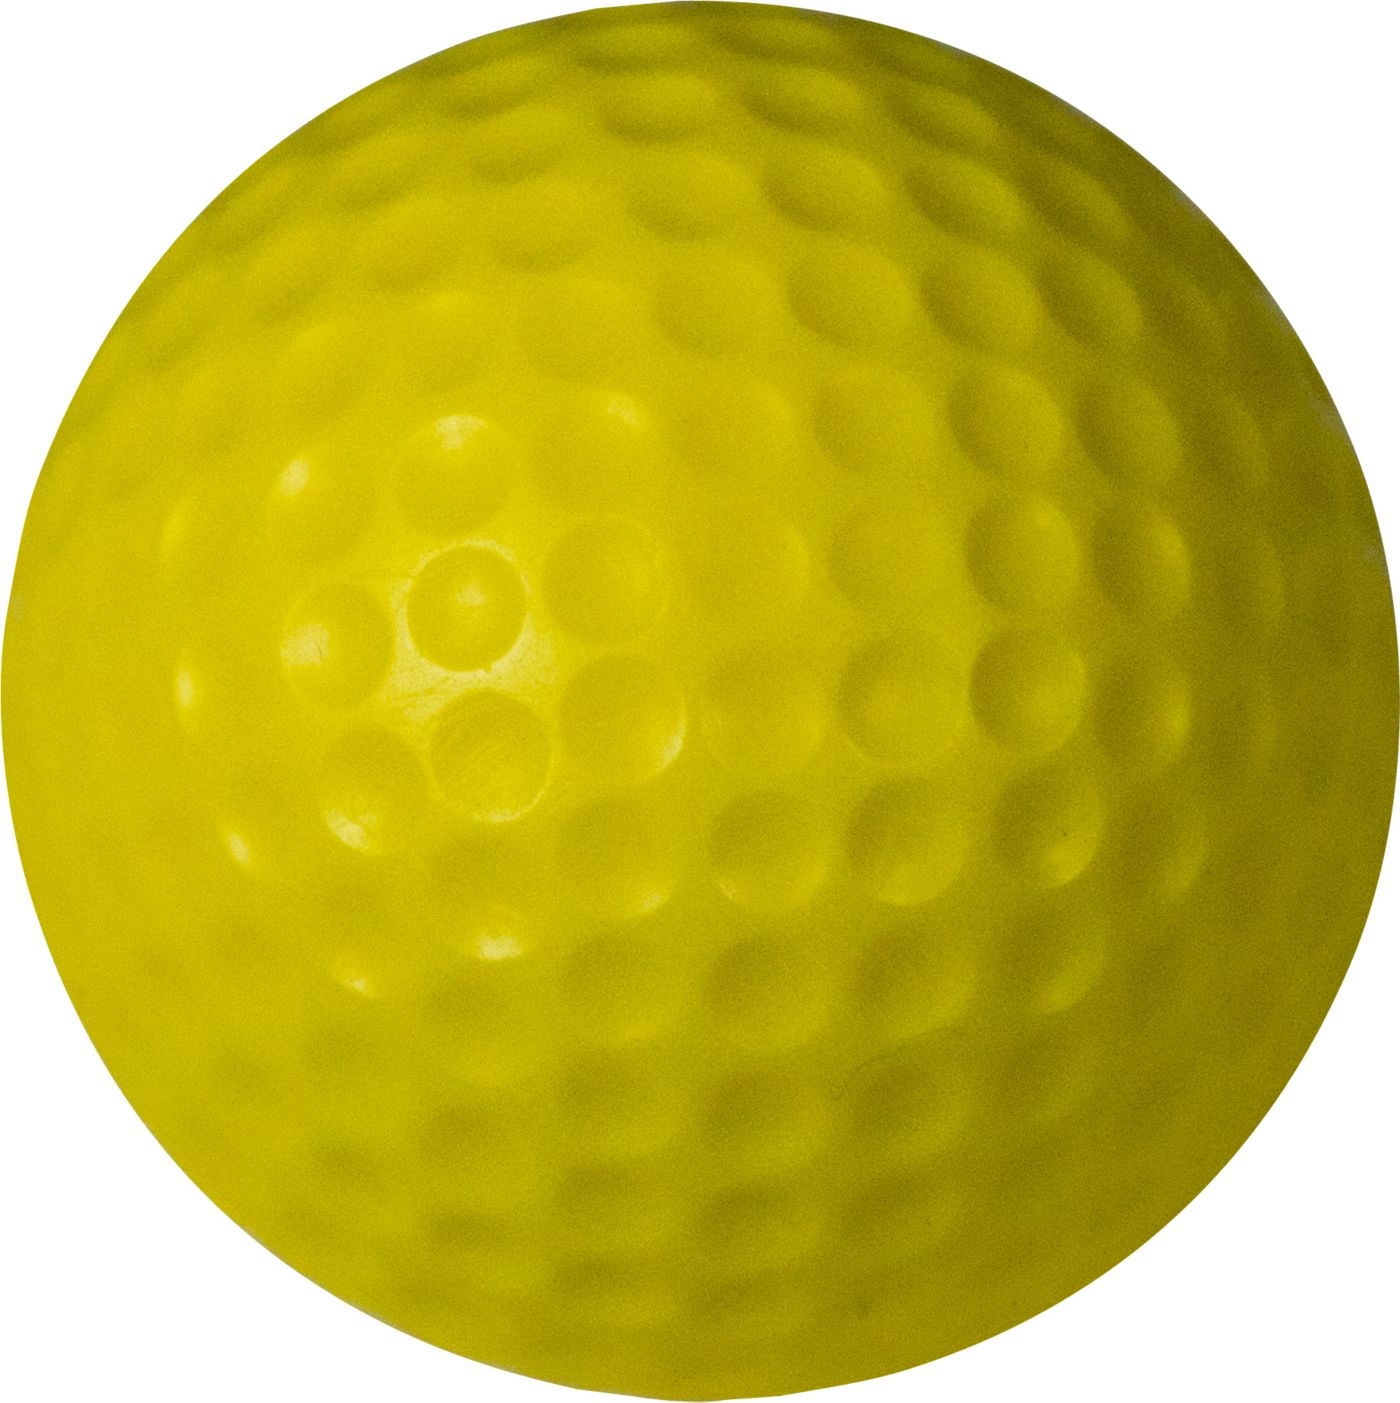 Maxfli Foam Yellow Practice Balls - 18 Pack